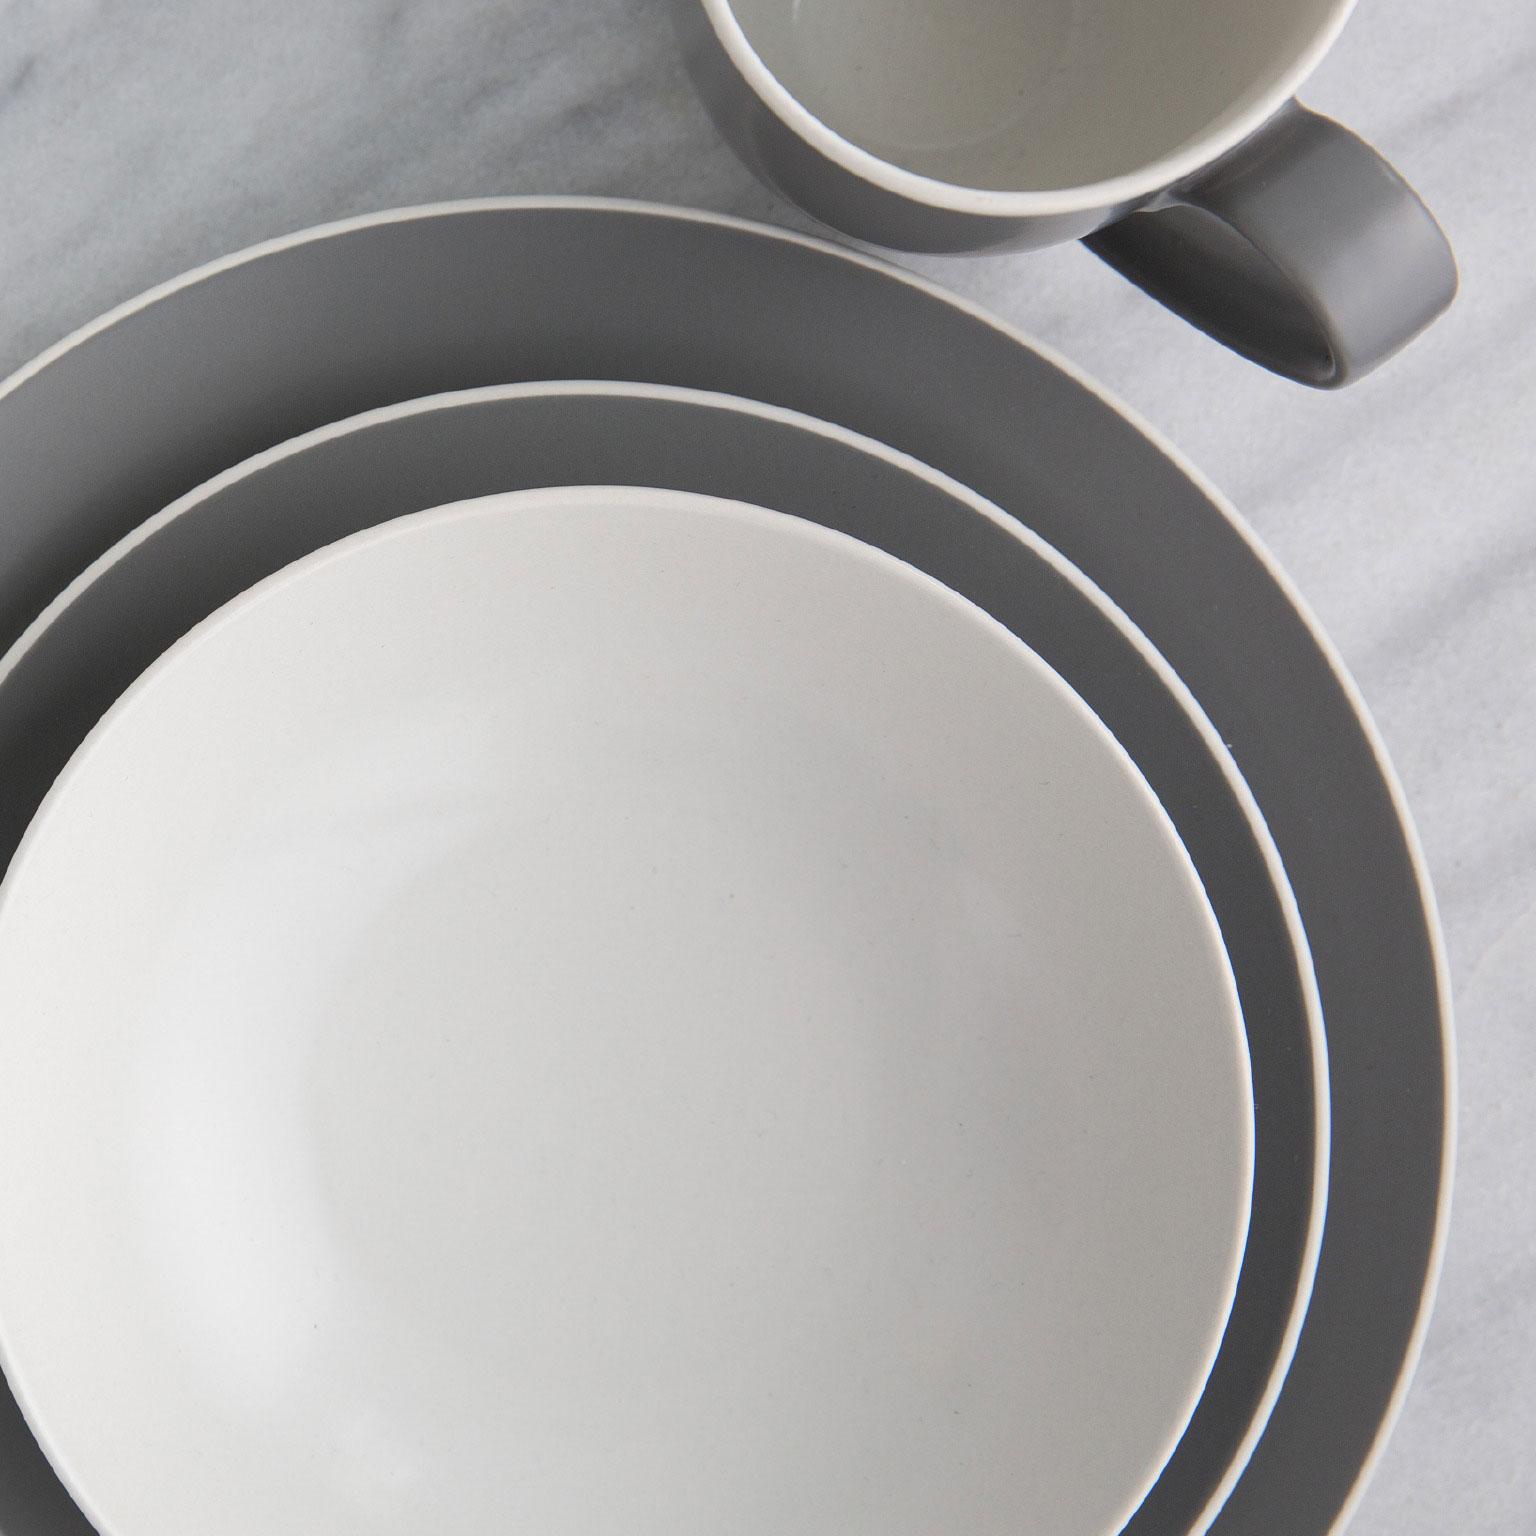 Dinnerware sets & Amazon.com: Dining \u0026 Entertaining: Home \u0026 Kitchen: Glassware ...